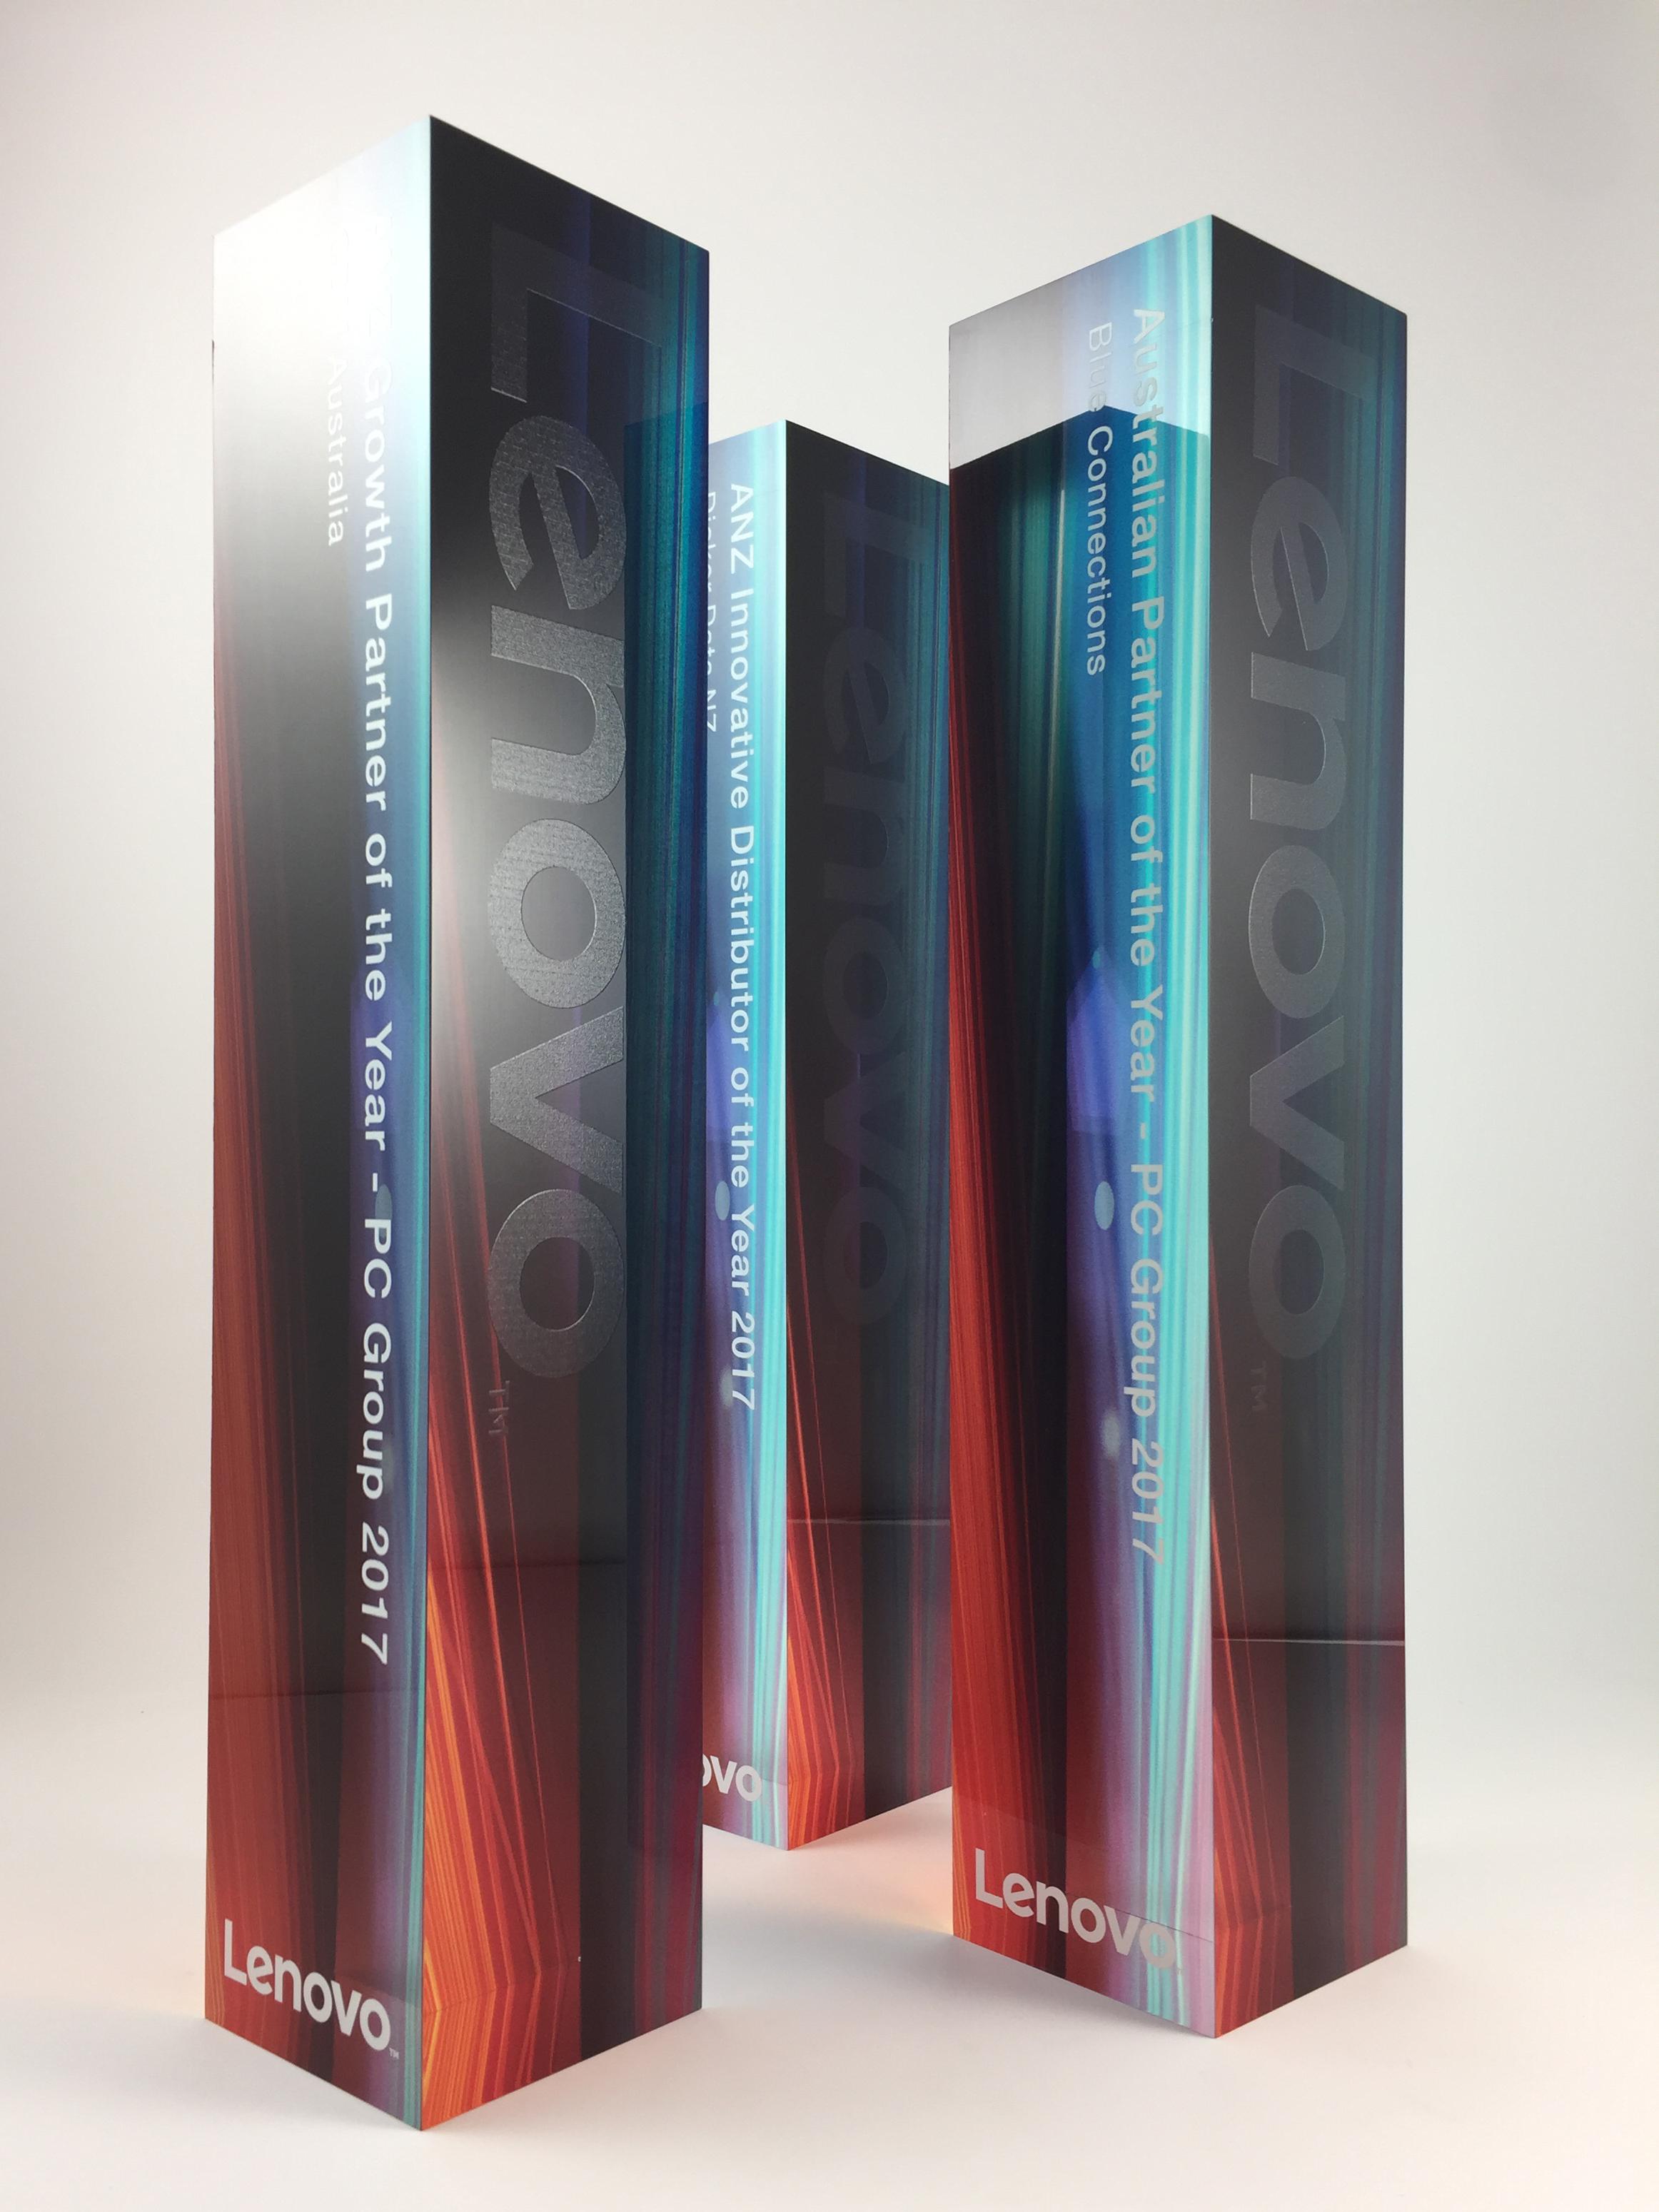 Lenovo-acrylic-trophy-awards-04.jpg